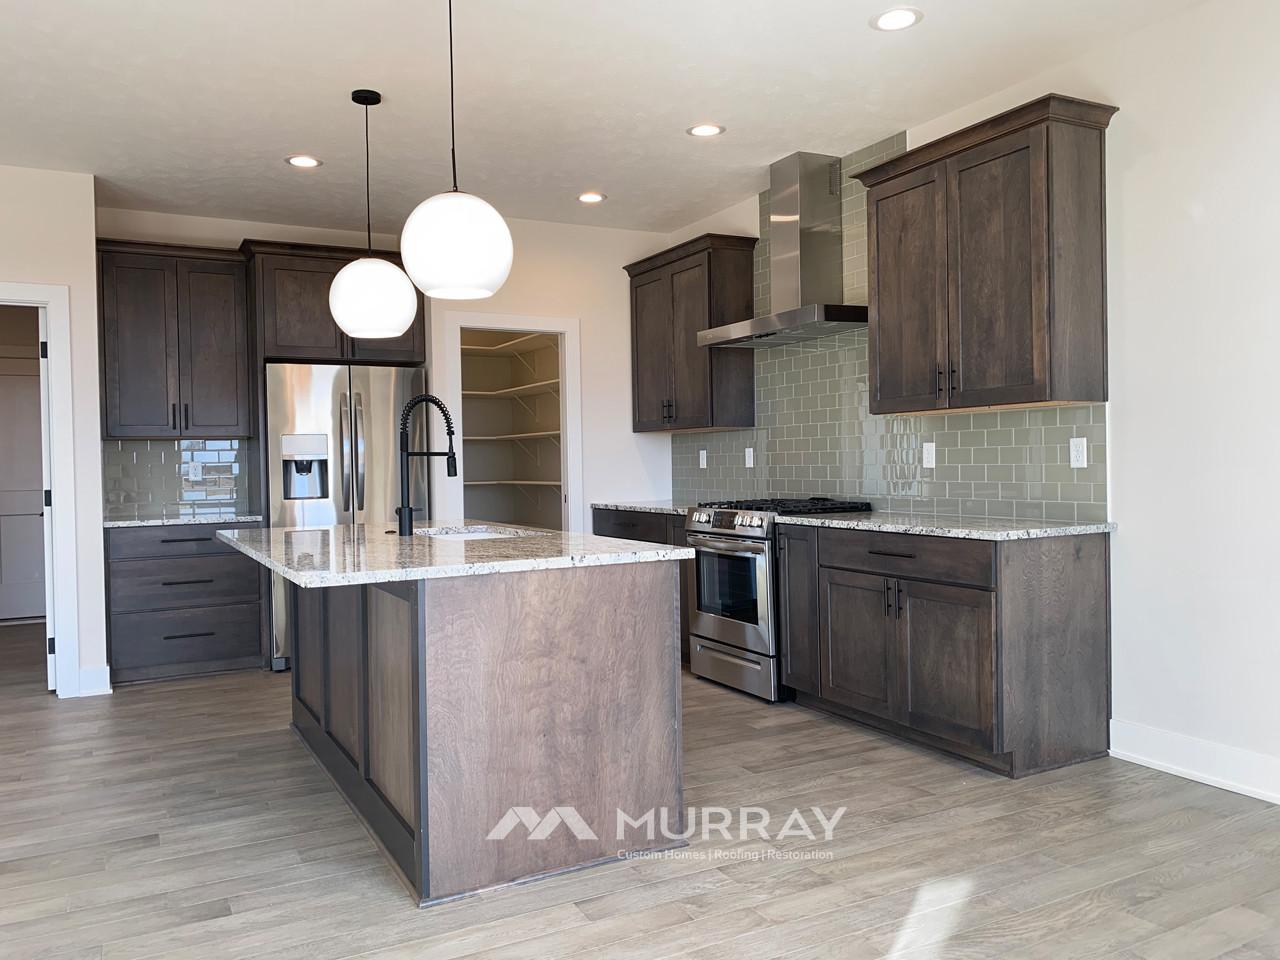 Murray Custom Home Builders Gallery SW Village Heights 6525 Kitchen1